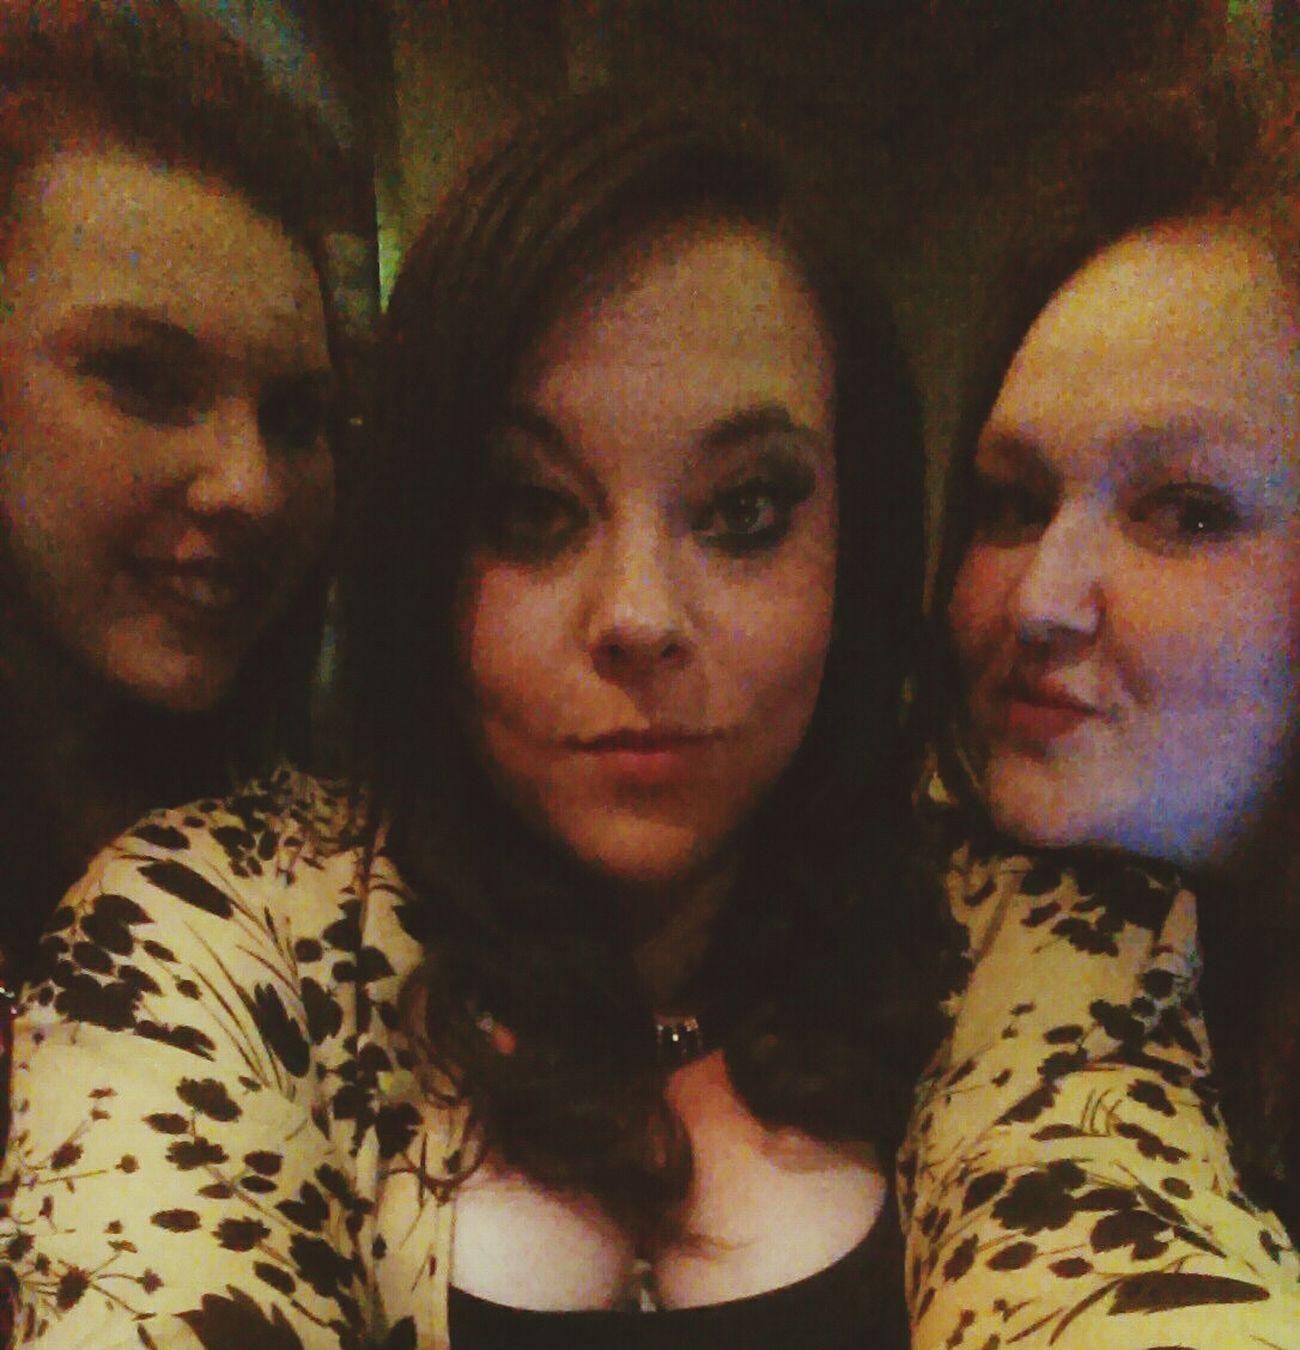 girls night out :)